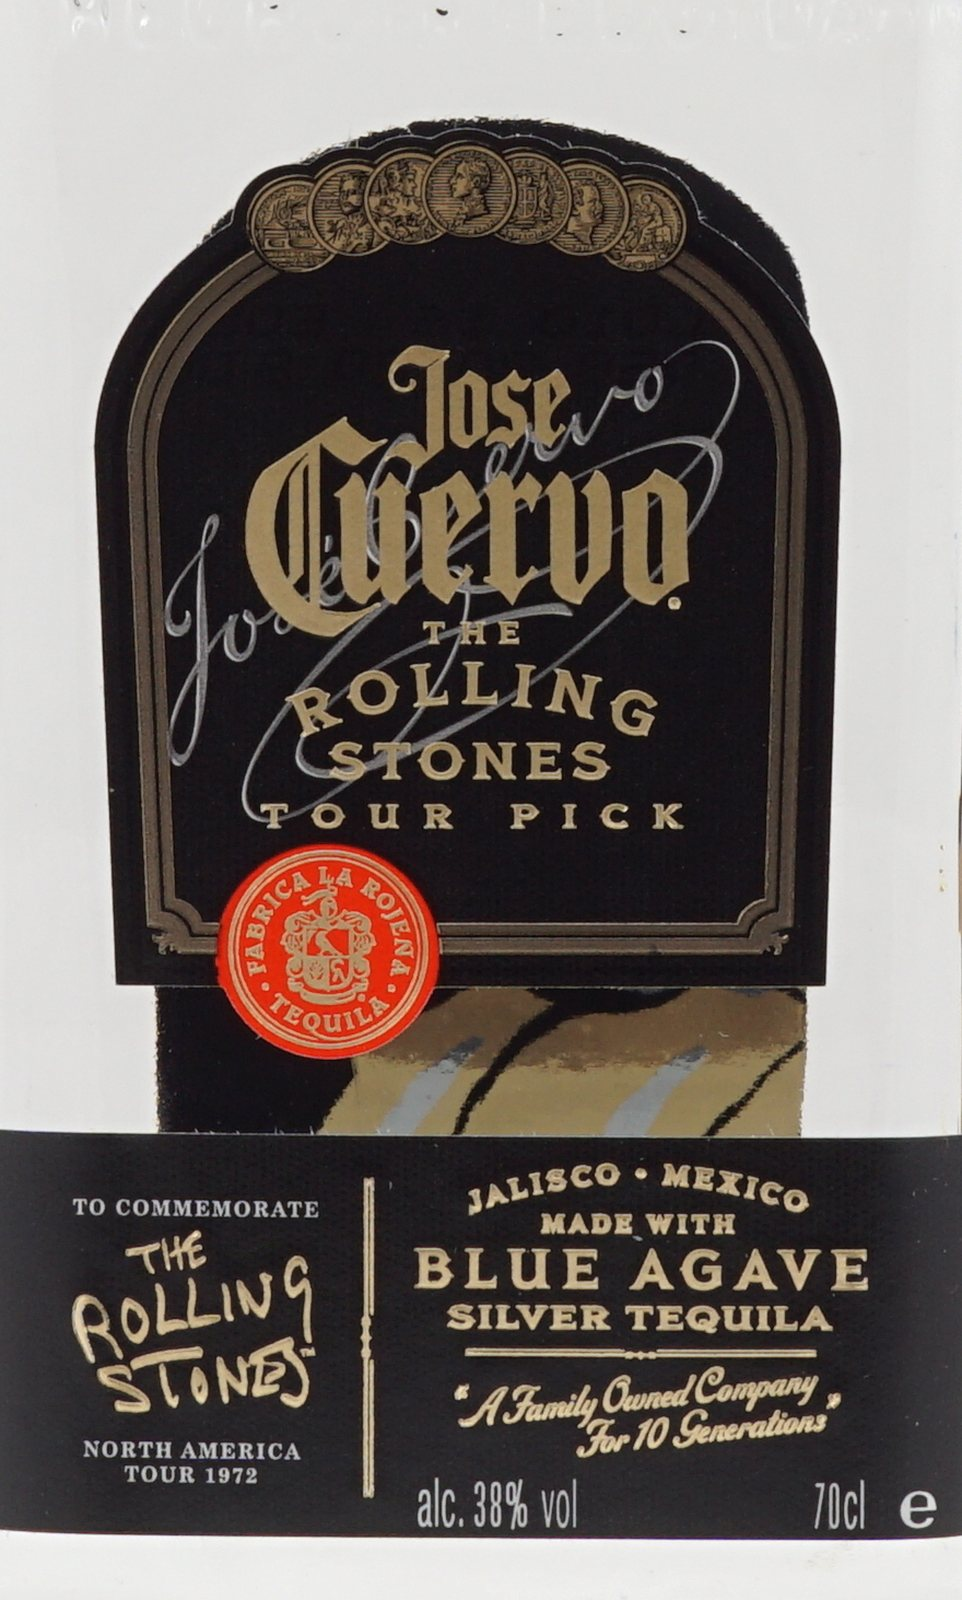 jose cuervo especial silver tequila rolling stones edition